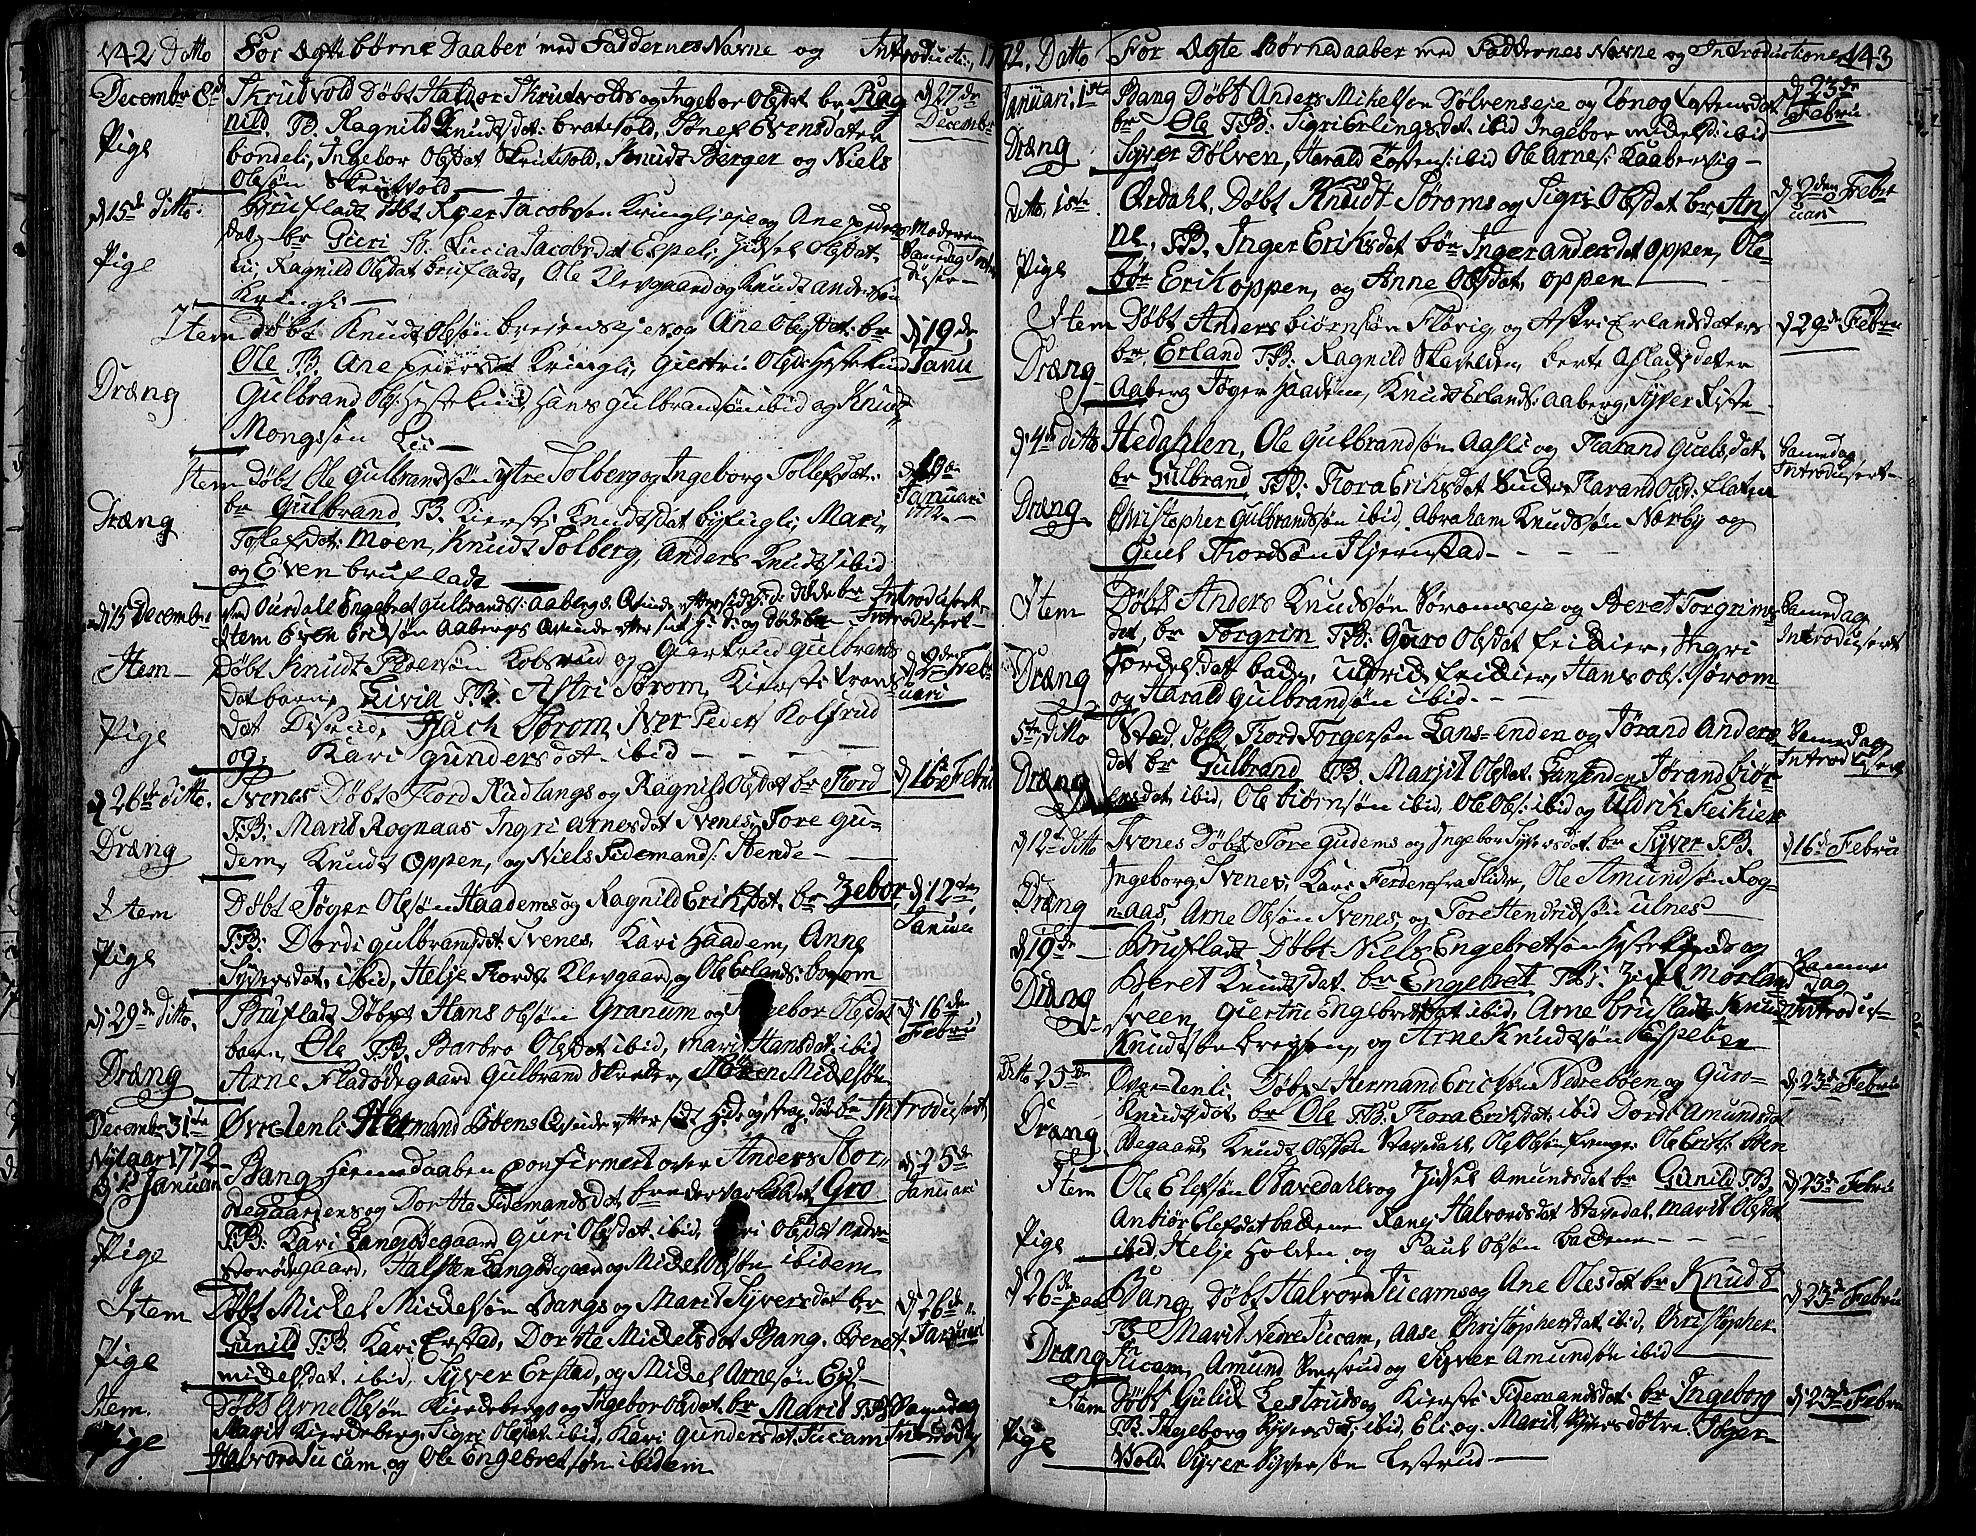 SAH, Aurdal prestekontor, Ministerialbok nr. 5, 1763-1781, s. 142-143